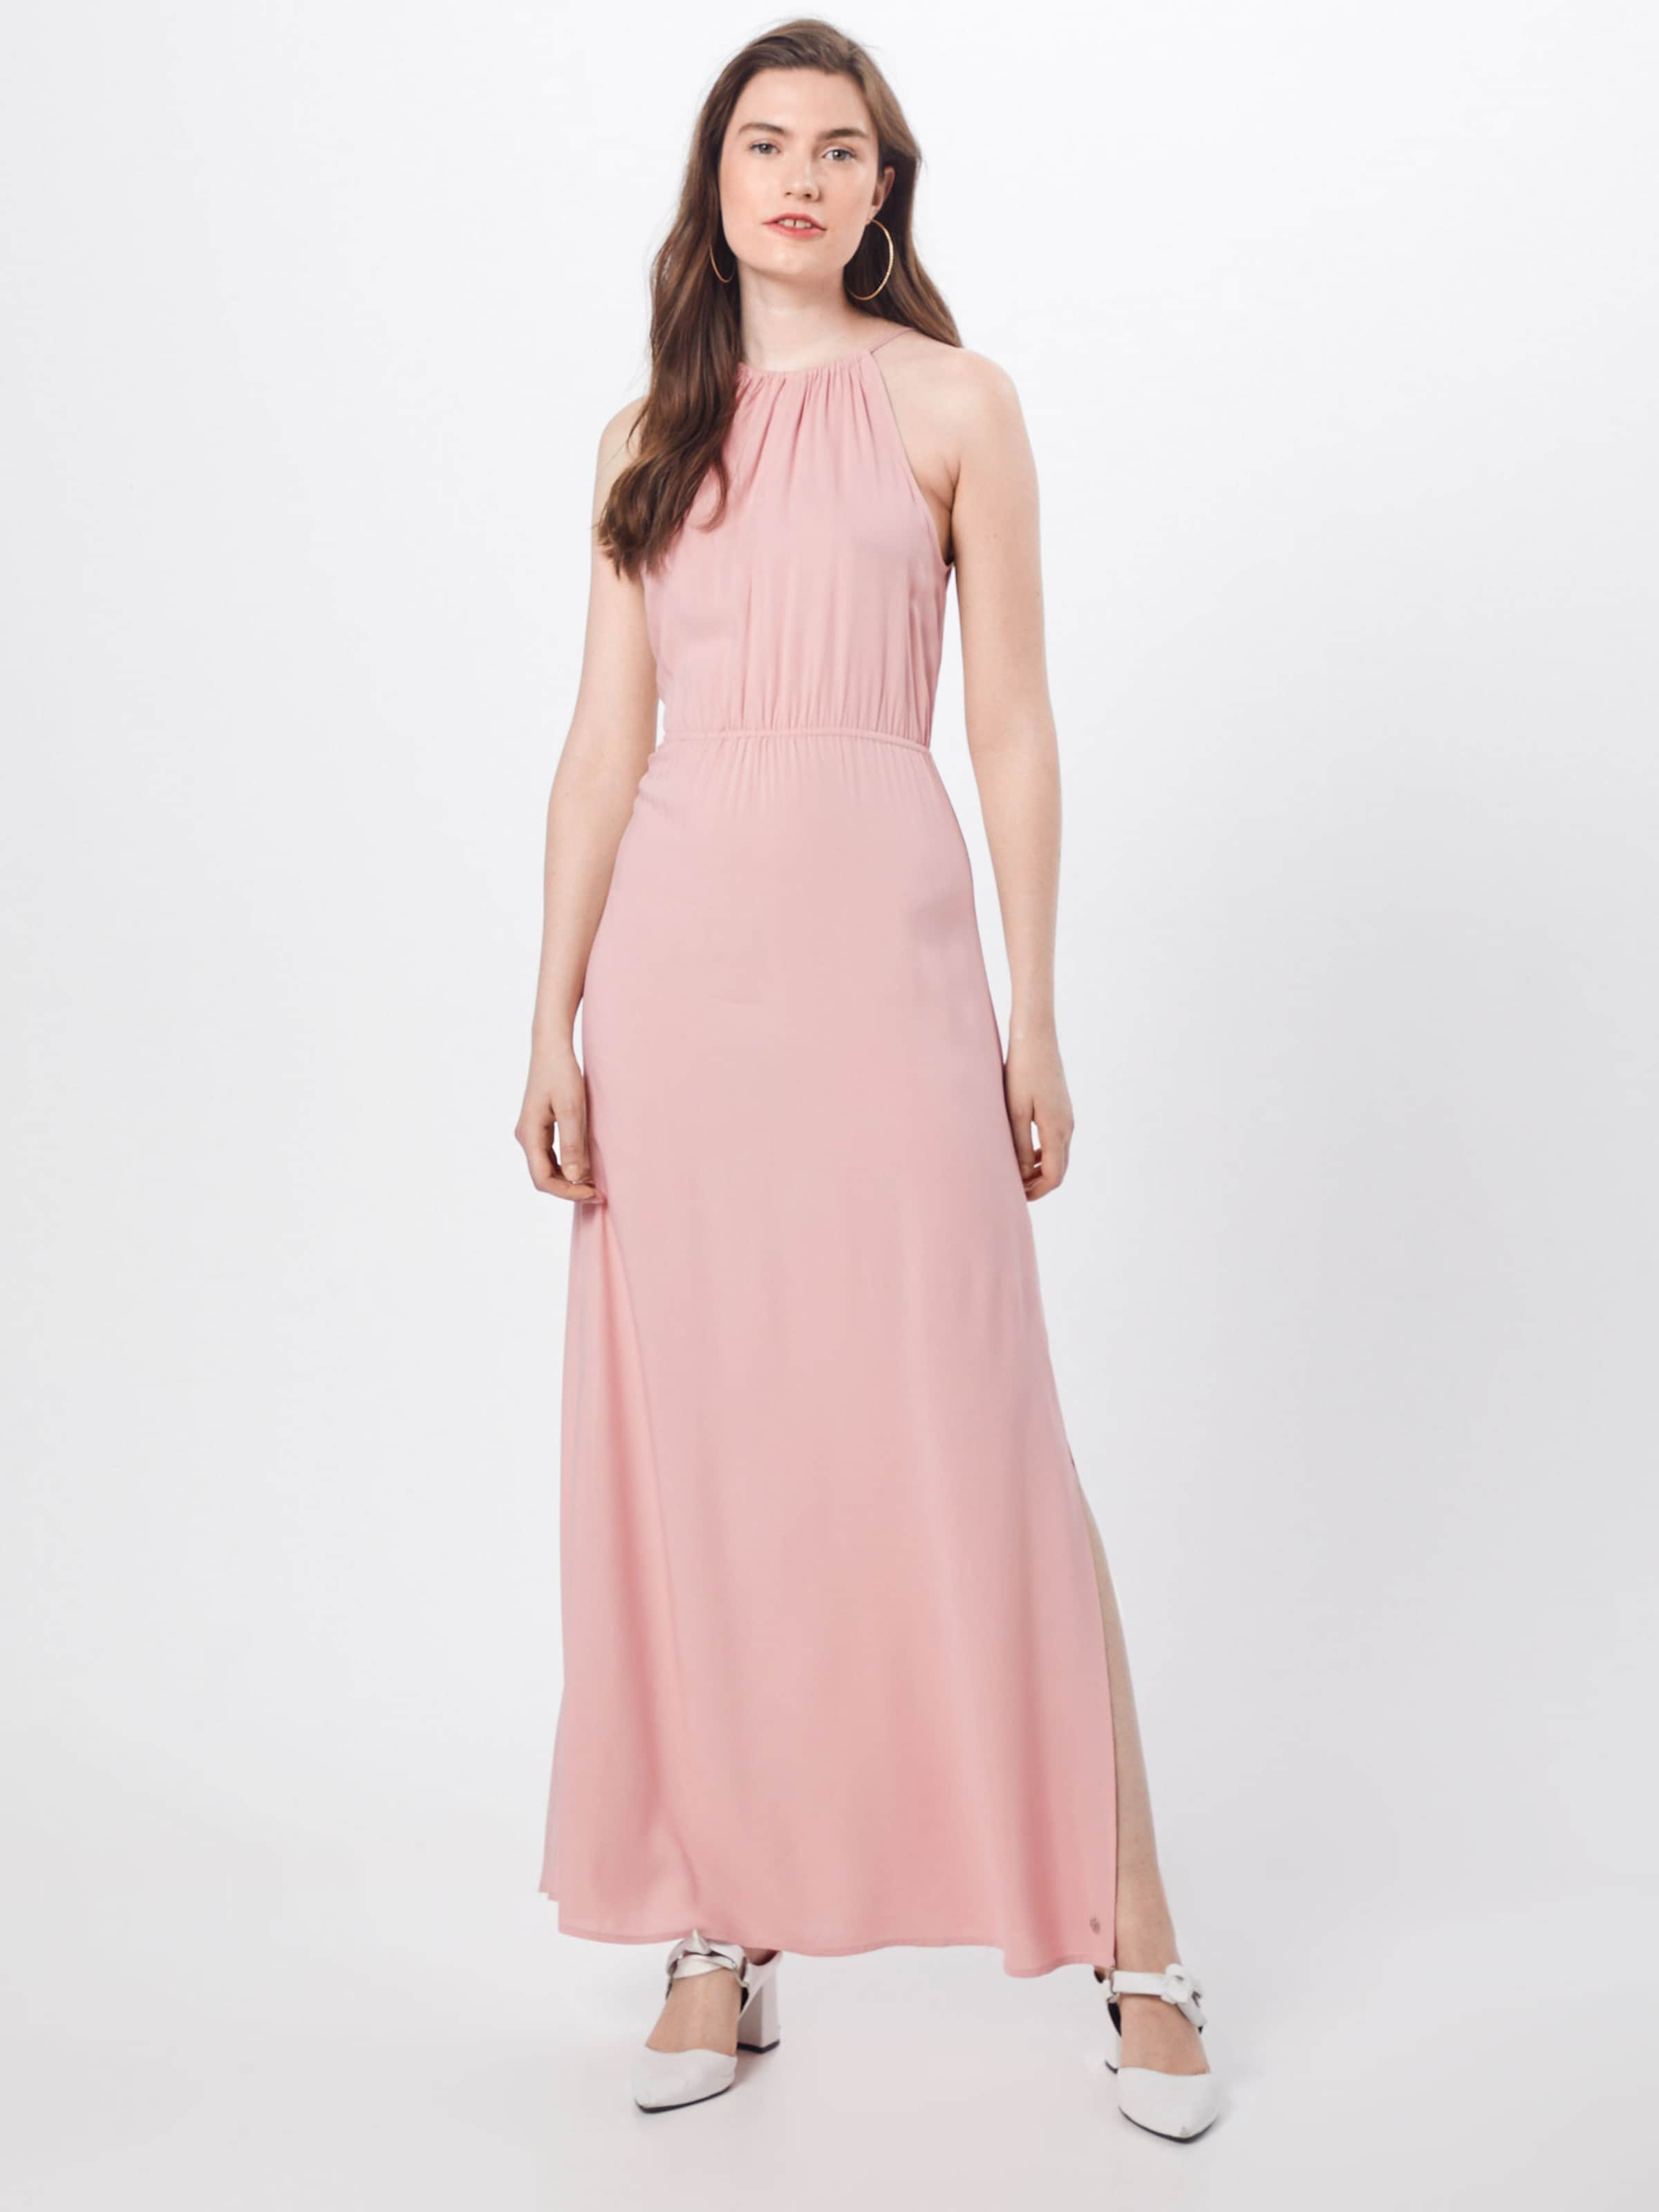 En Rosé Robe Tom Tailor Denim 6vYbmfI7gy